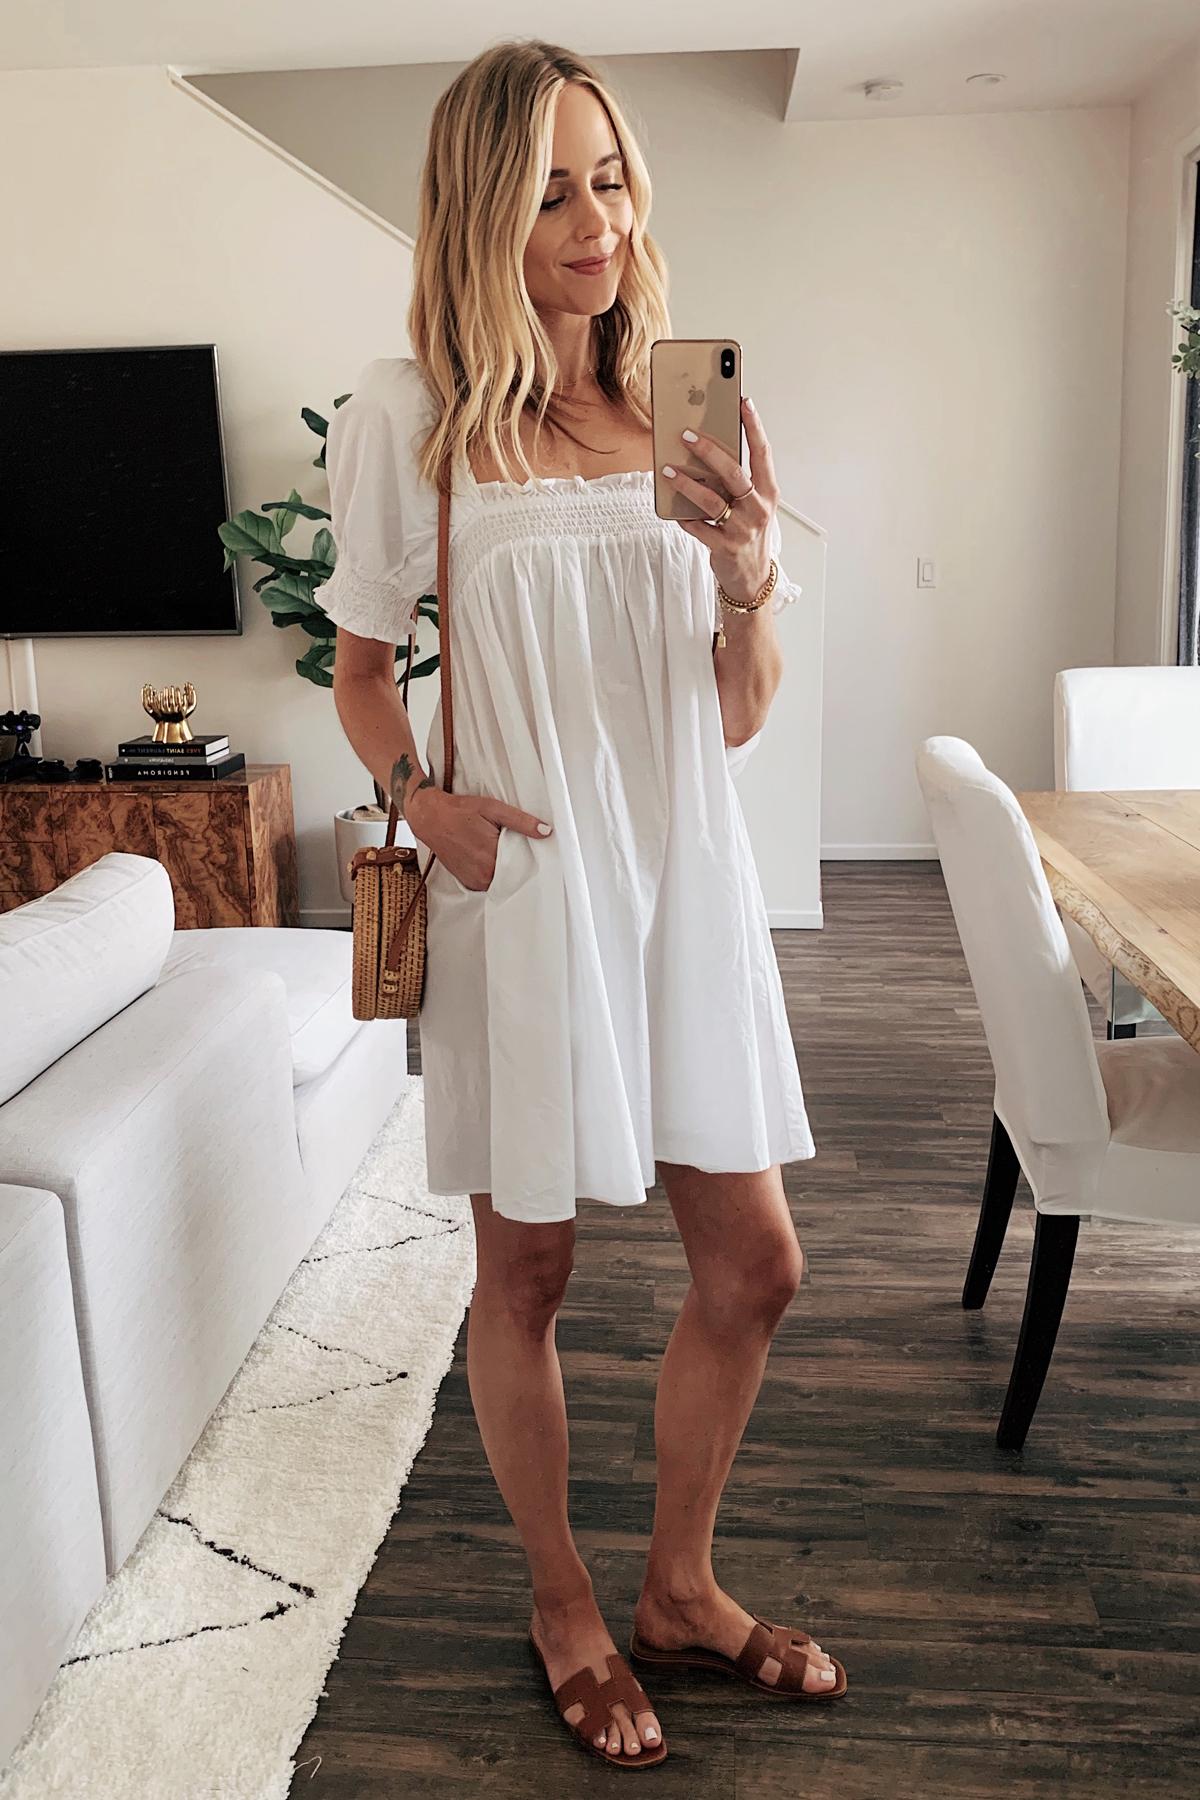 Fashion Jackson Wearing White Summer Dress